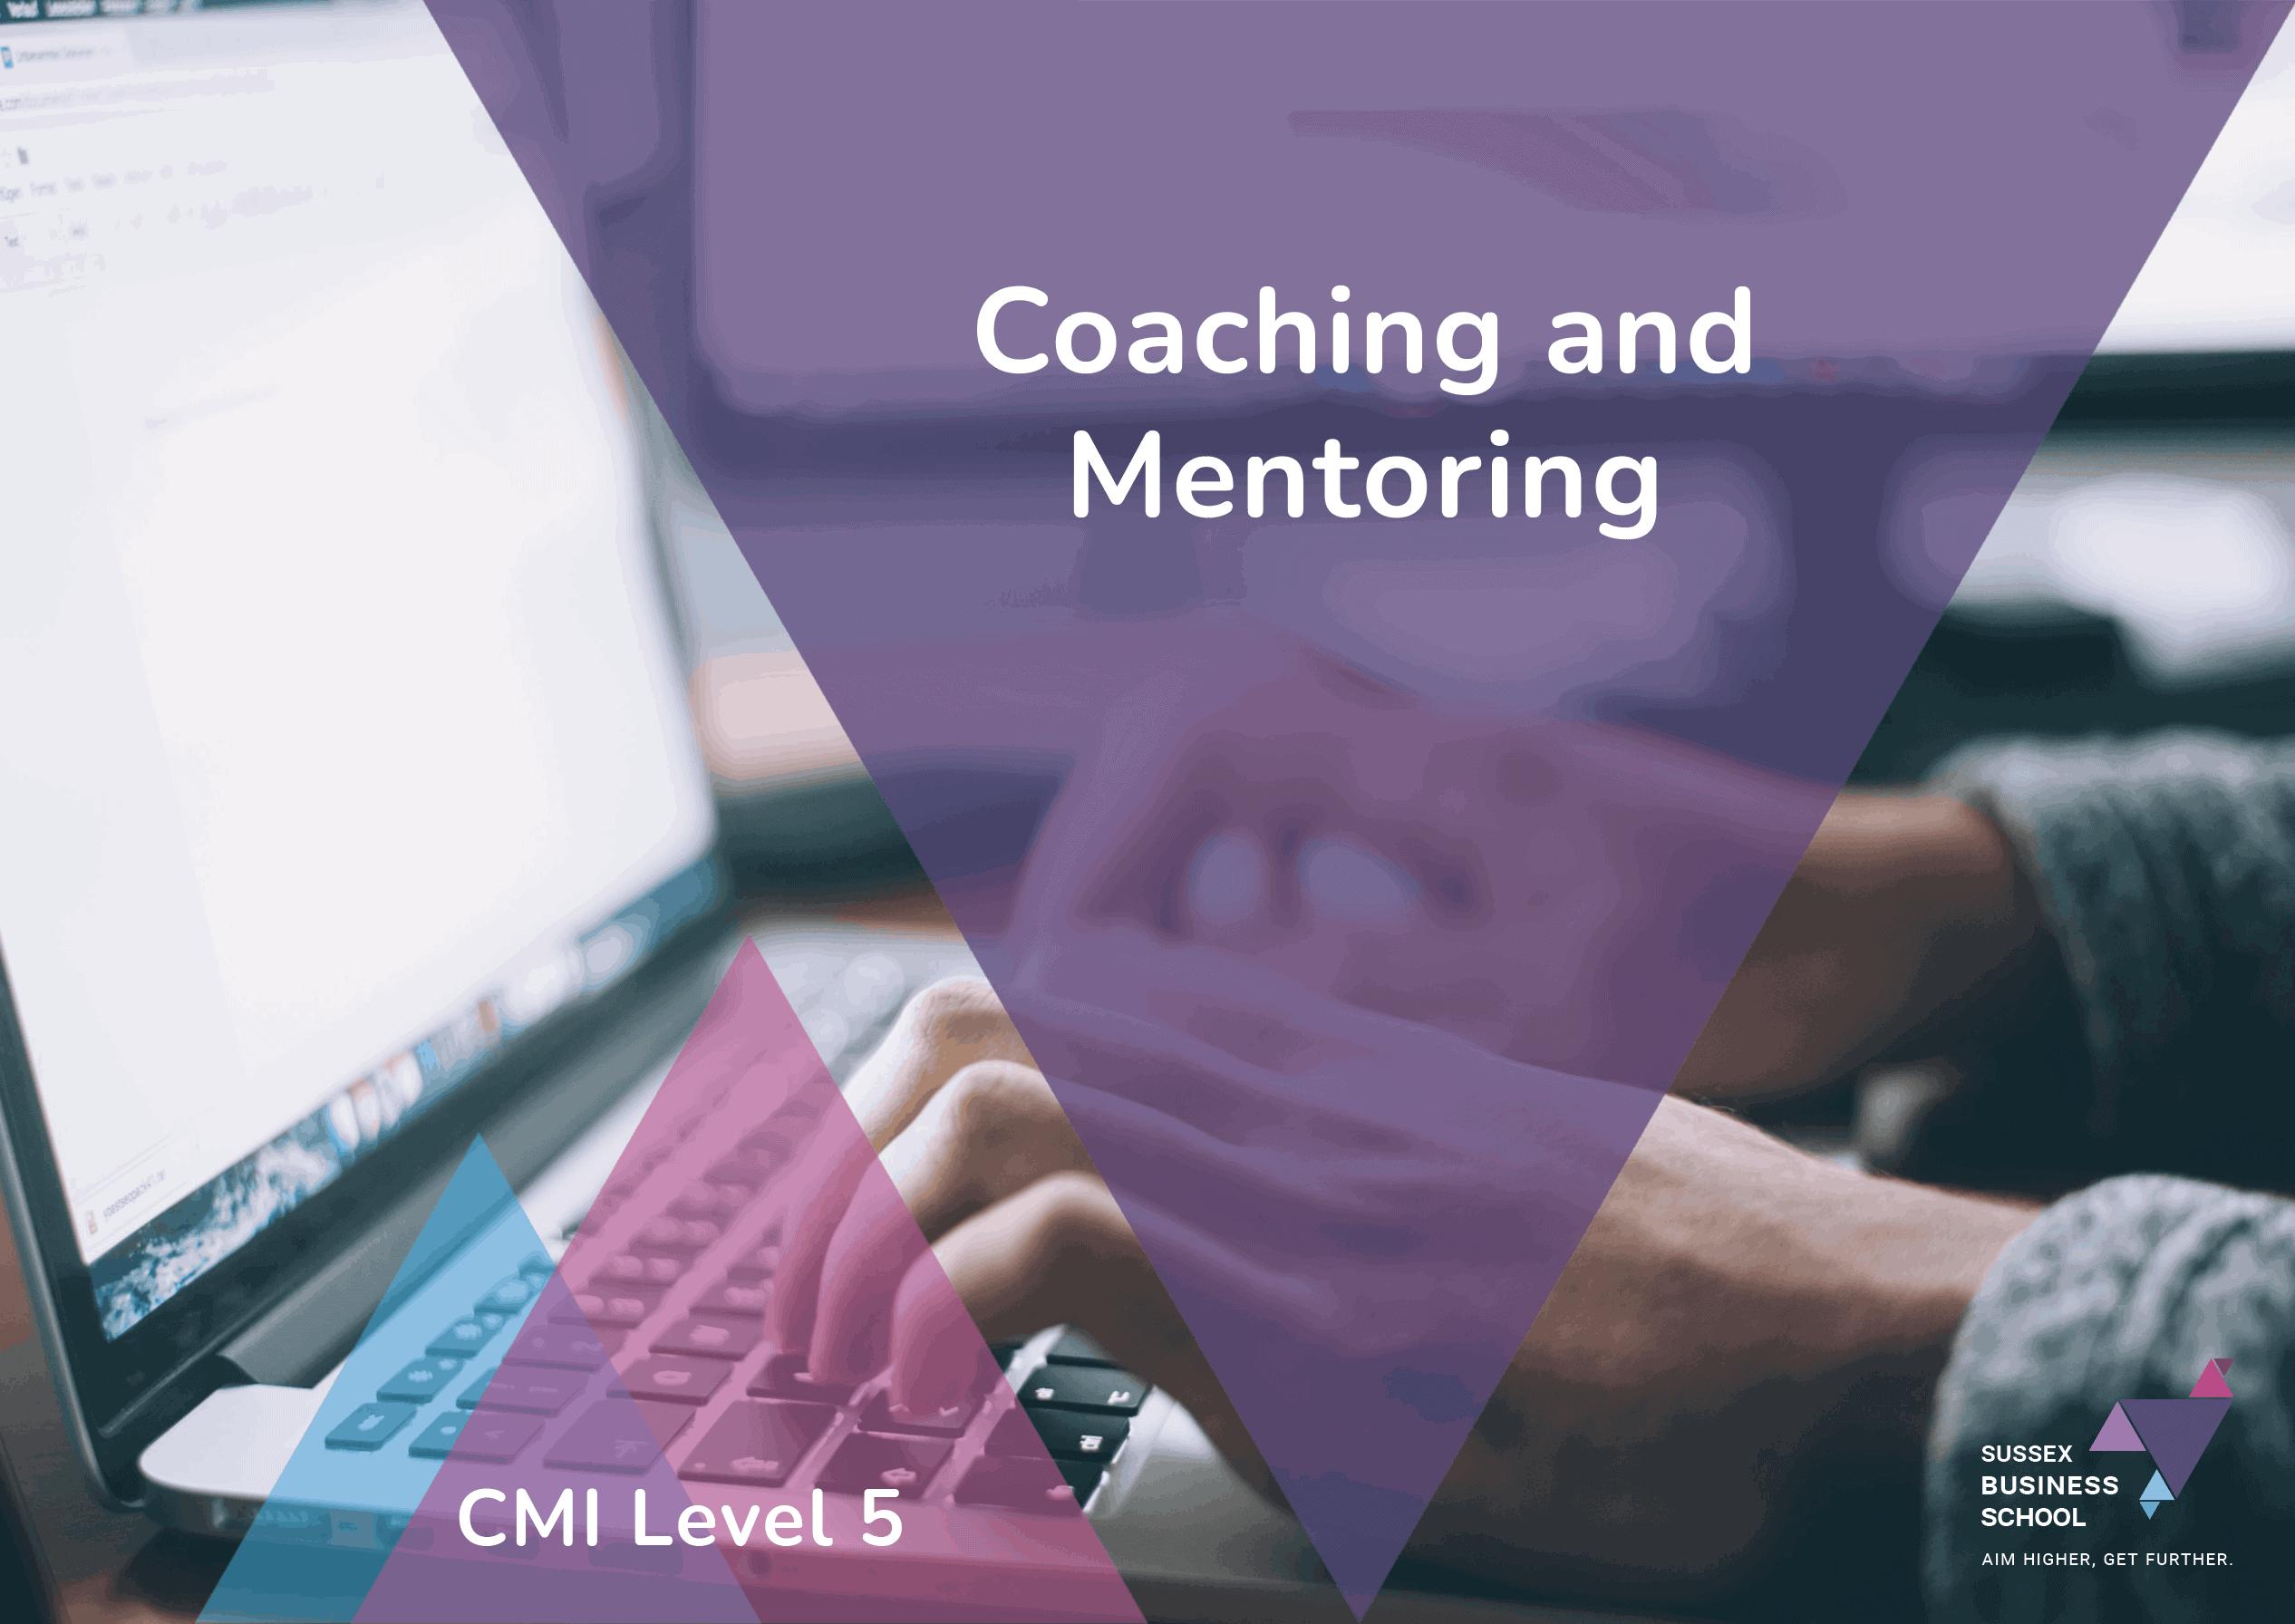 cmi level 5 coaching and mentoring info pdf